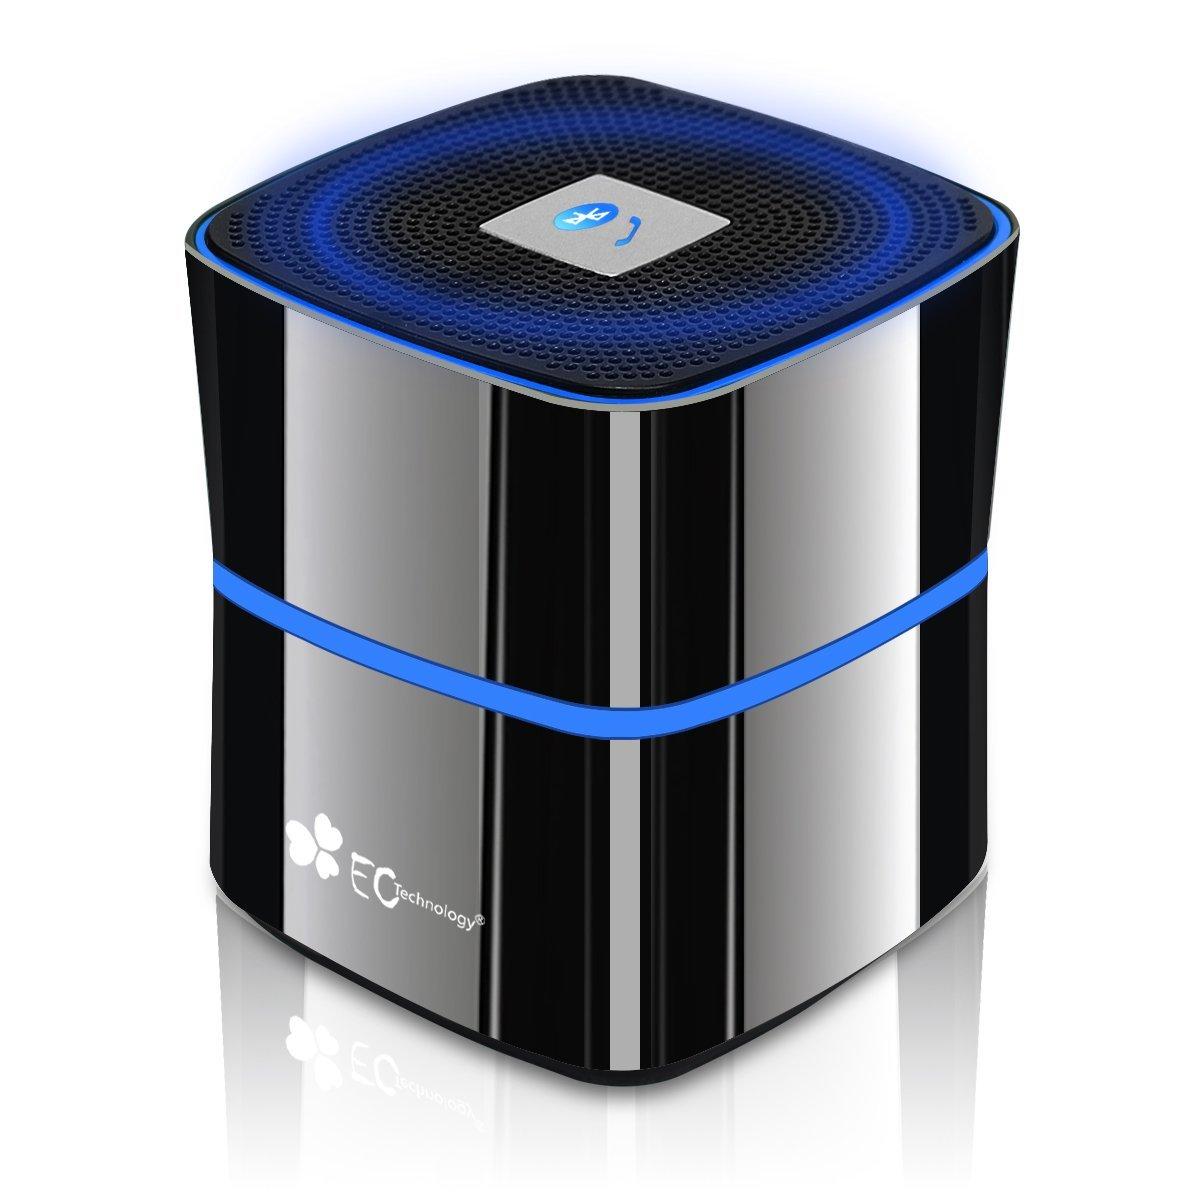 EC Technology Mini